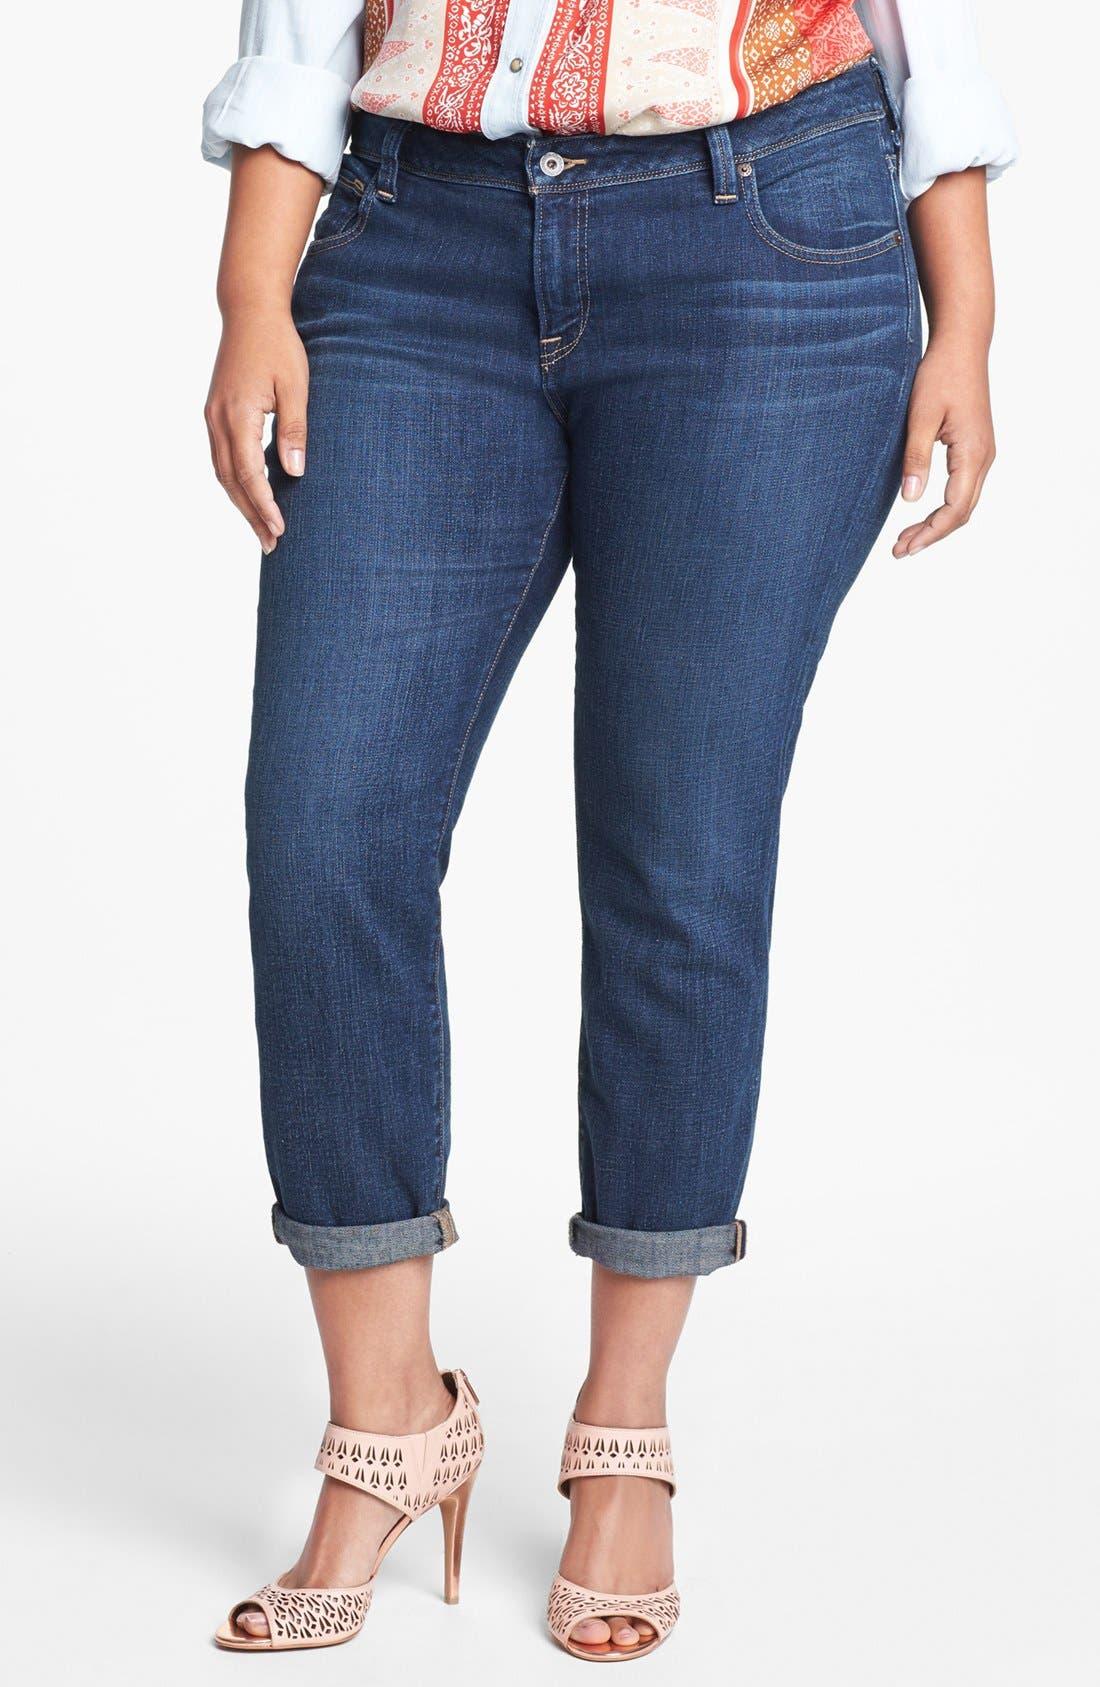 Main Image - Lucky Brand 'Georgia' Boyfriend Jeans (Plus Size)